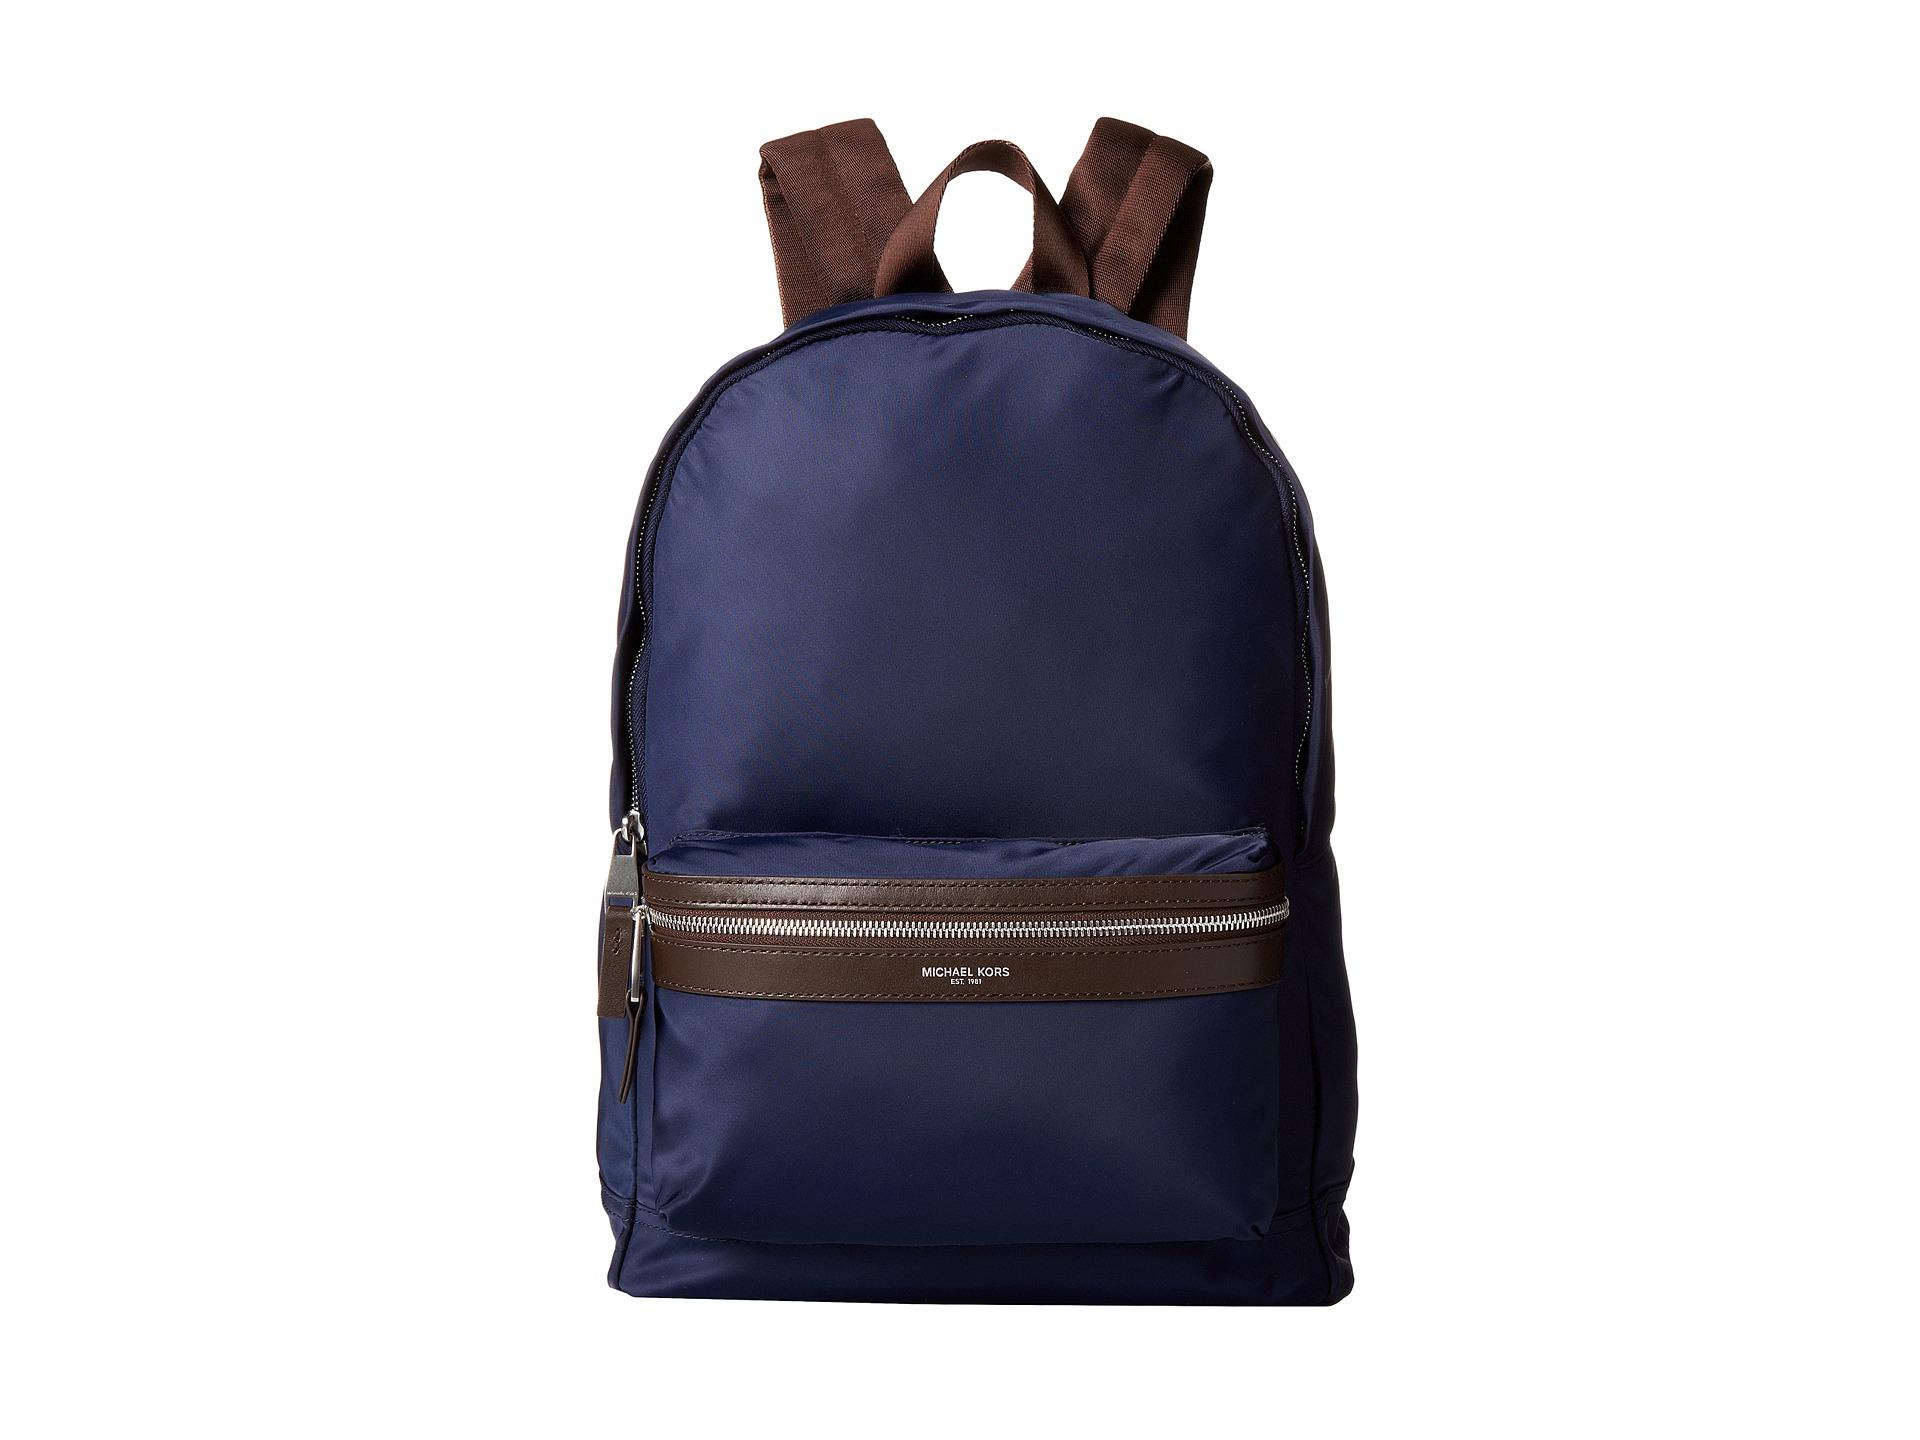 087ddbf96616 Michael Kors Kent Backpack in Blue for Men - Lyst